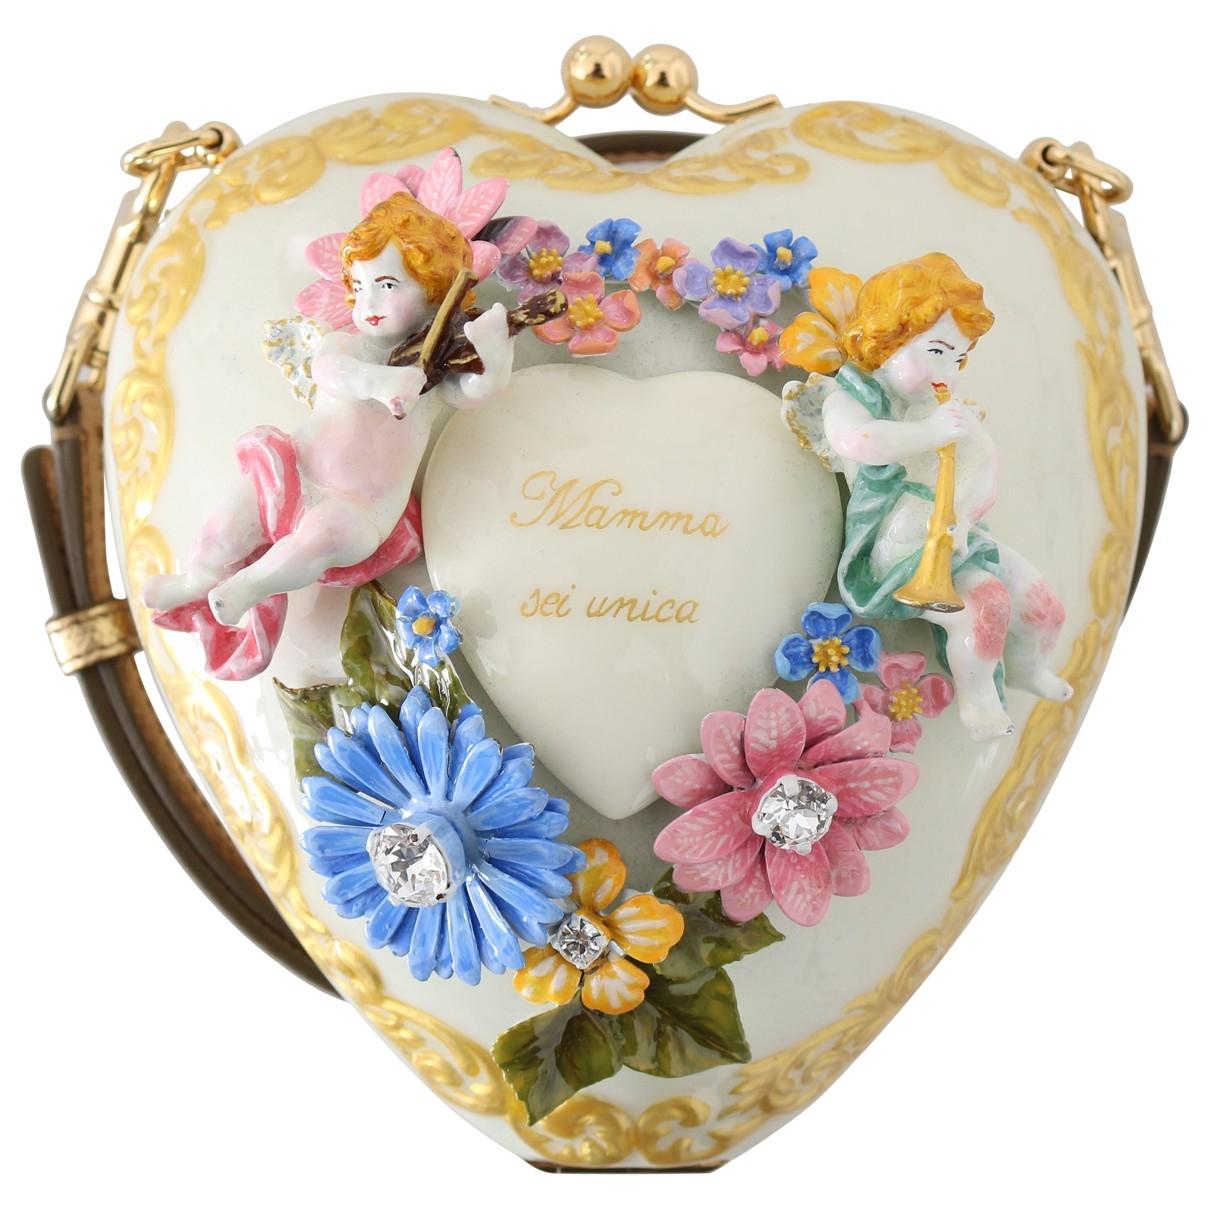 Dolce & Gabbana - Sac a main   pour femme - blanc